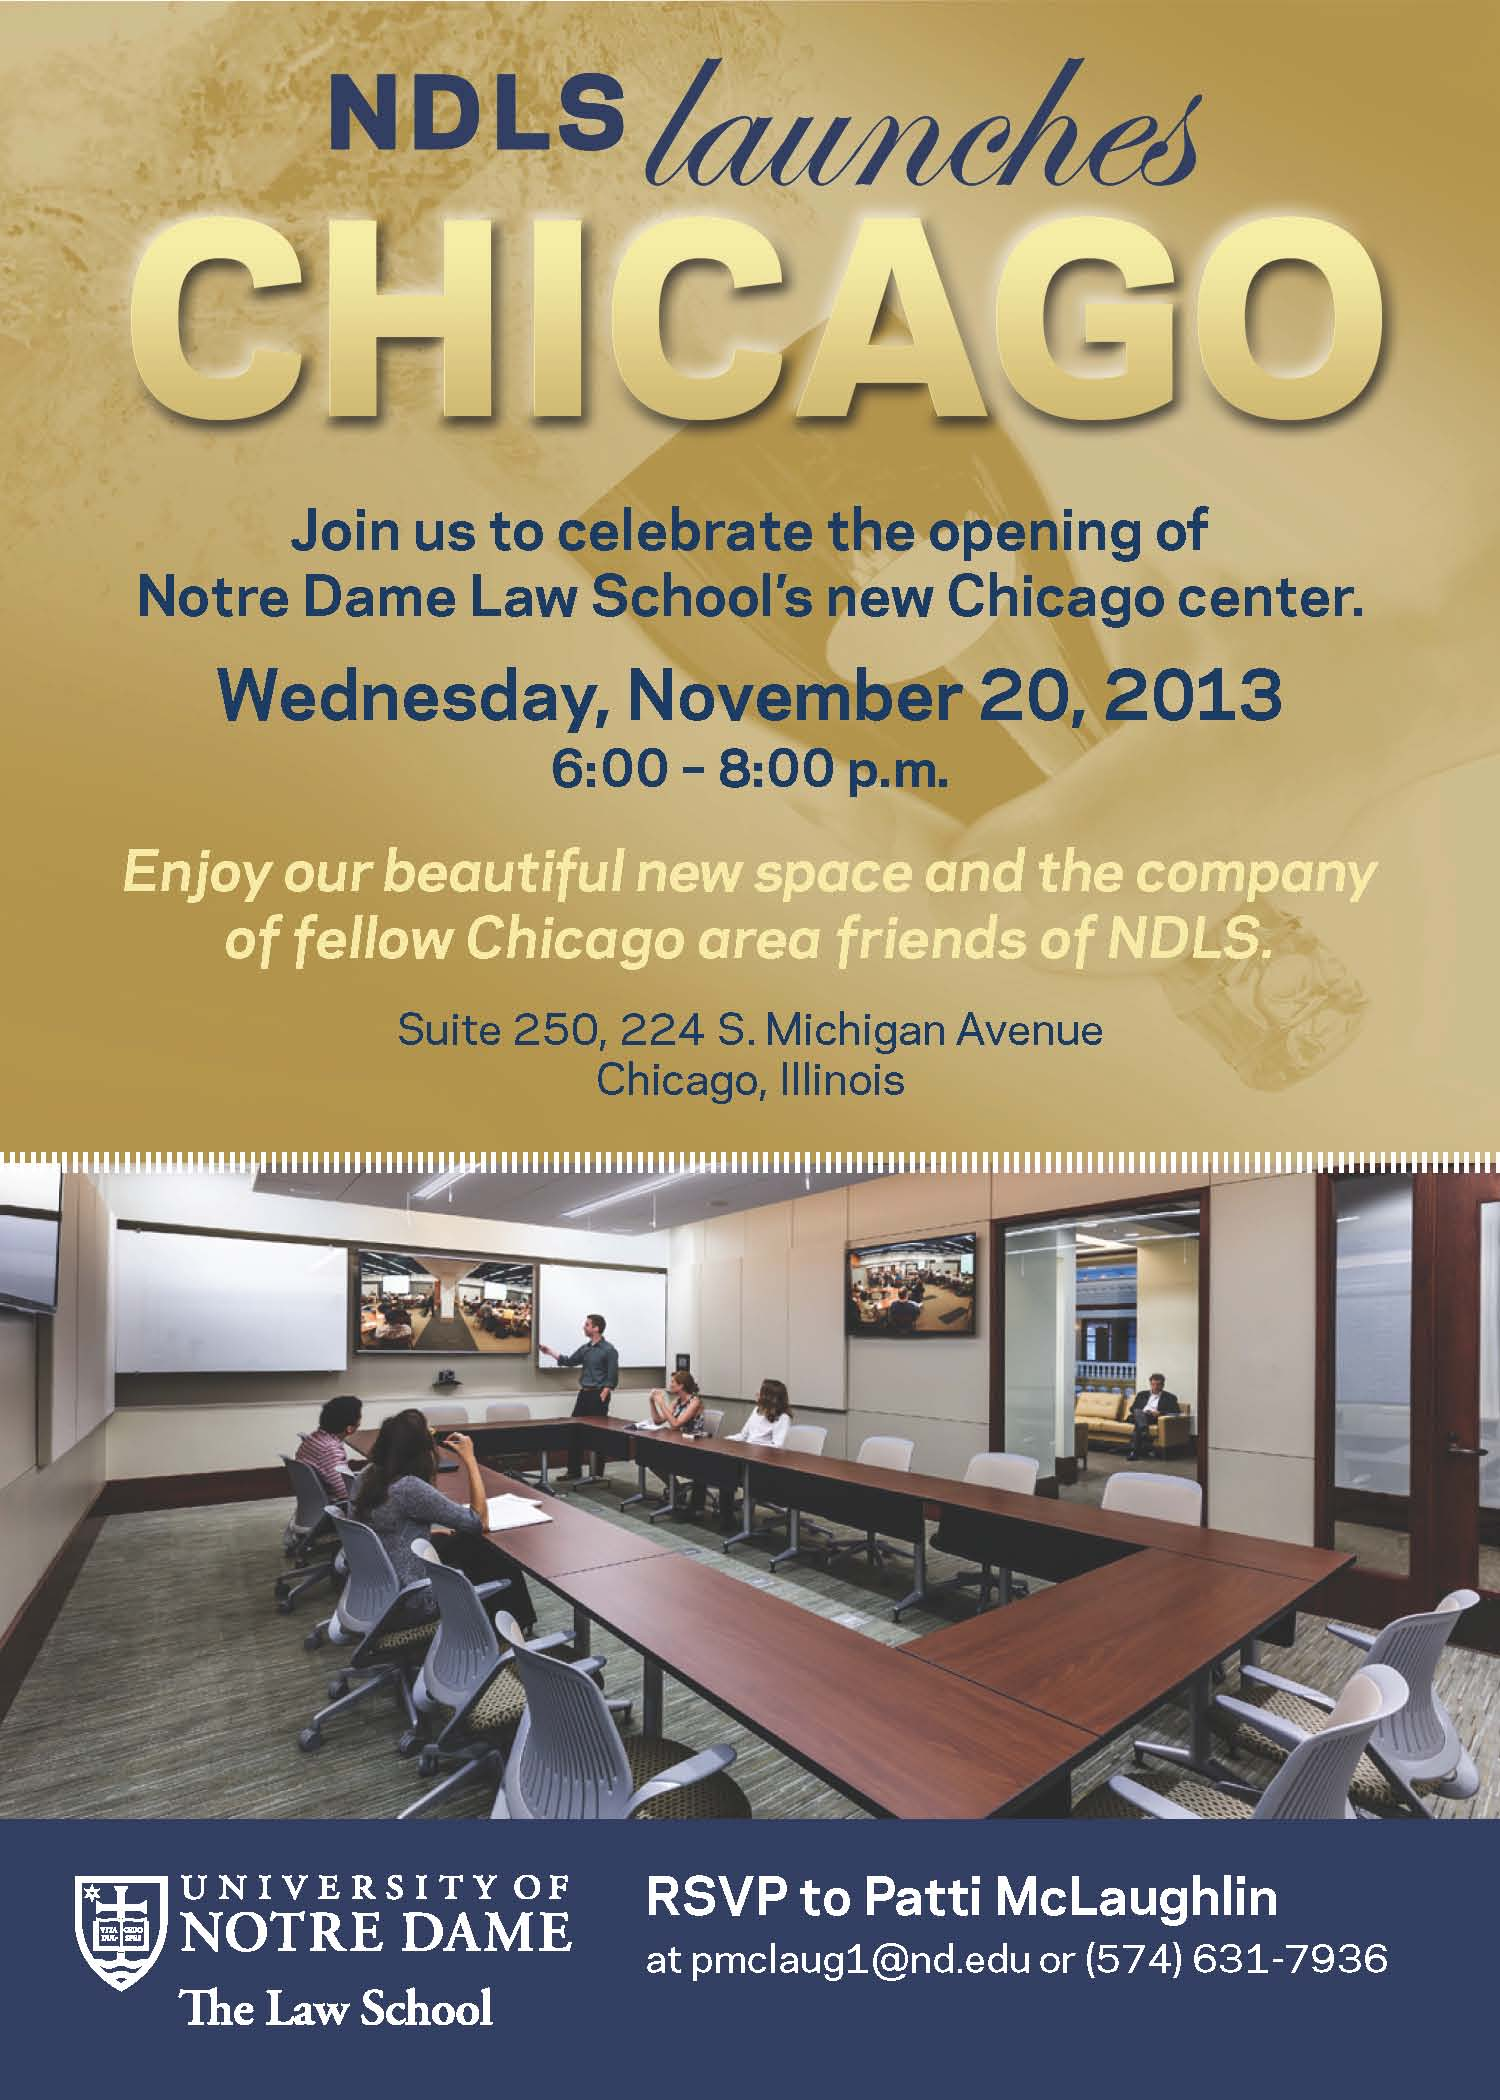 NDLS Chicago Launch Invite2